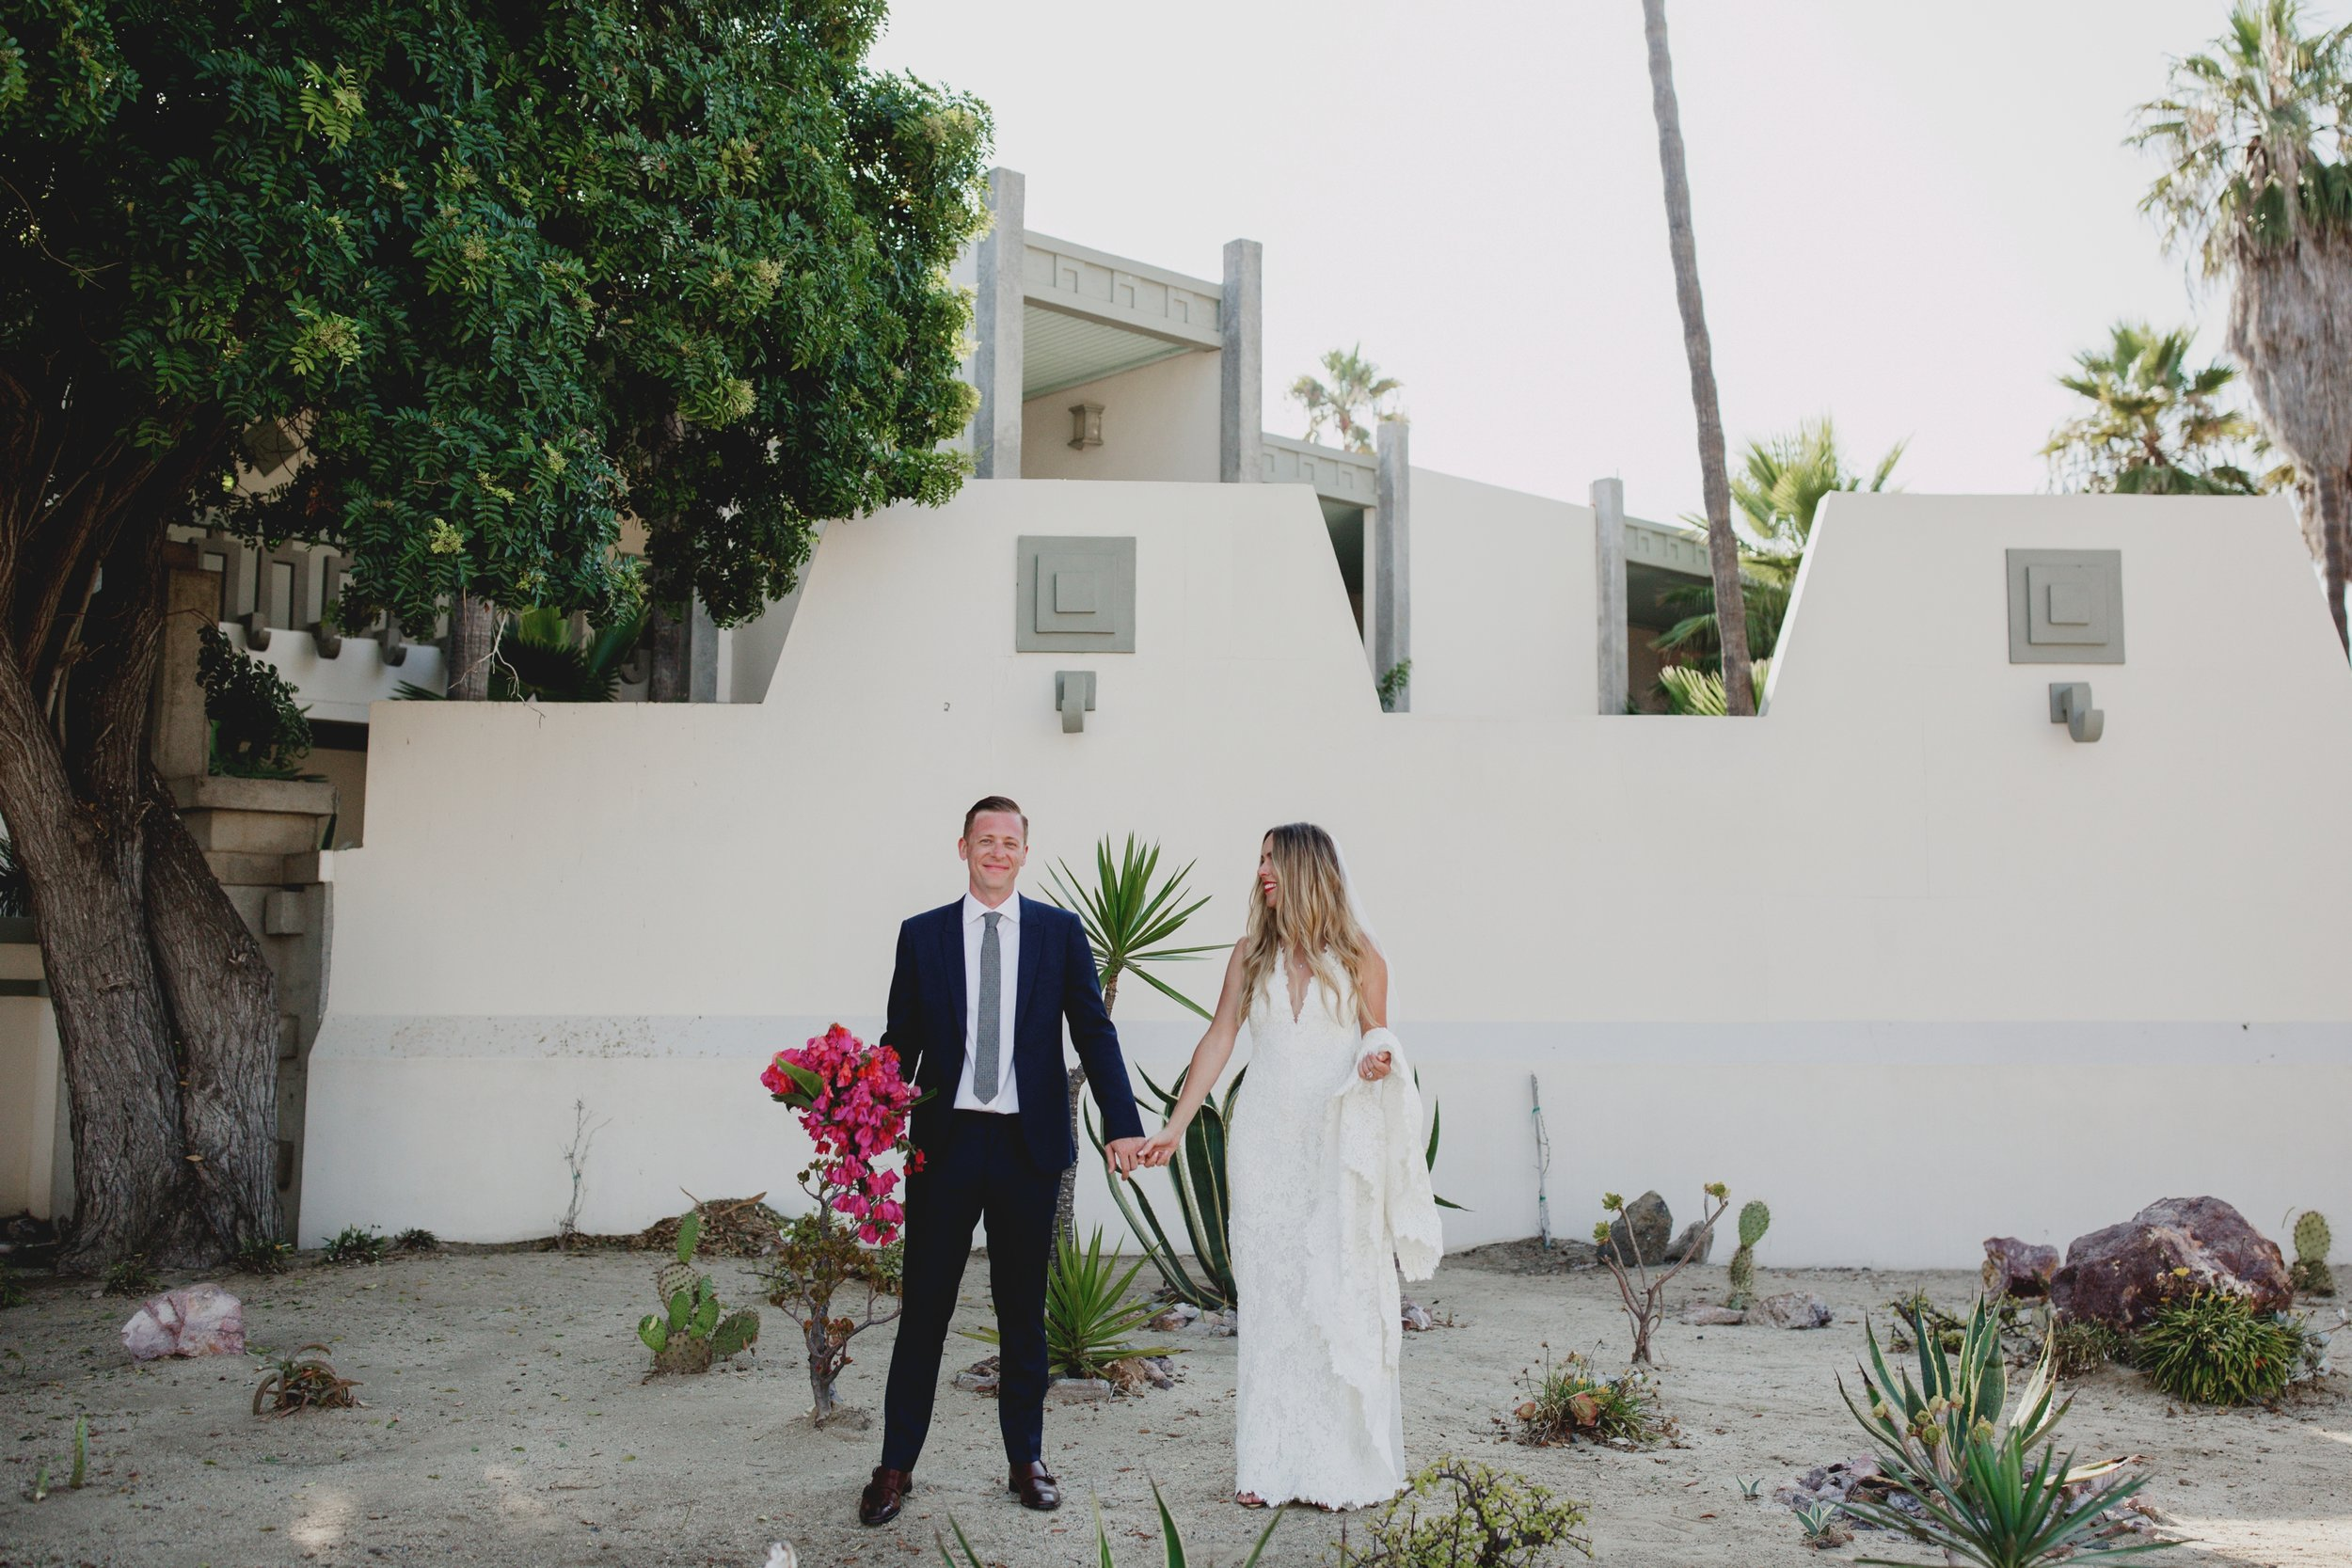 amandavanvels_ensenada_mexico_wedding_055.jpg